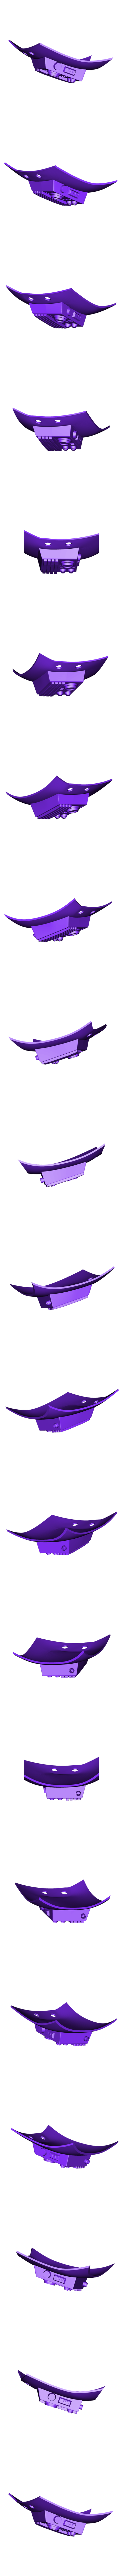 Hex3D_ImpGunner_Dome_Part6.stl Download STL file Imperial Gunner 3D Printable Helmet • 3D print design, Geoffro